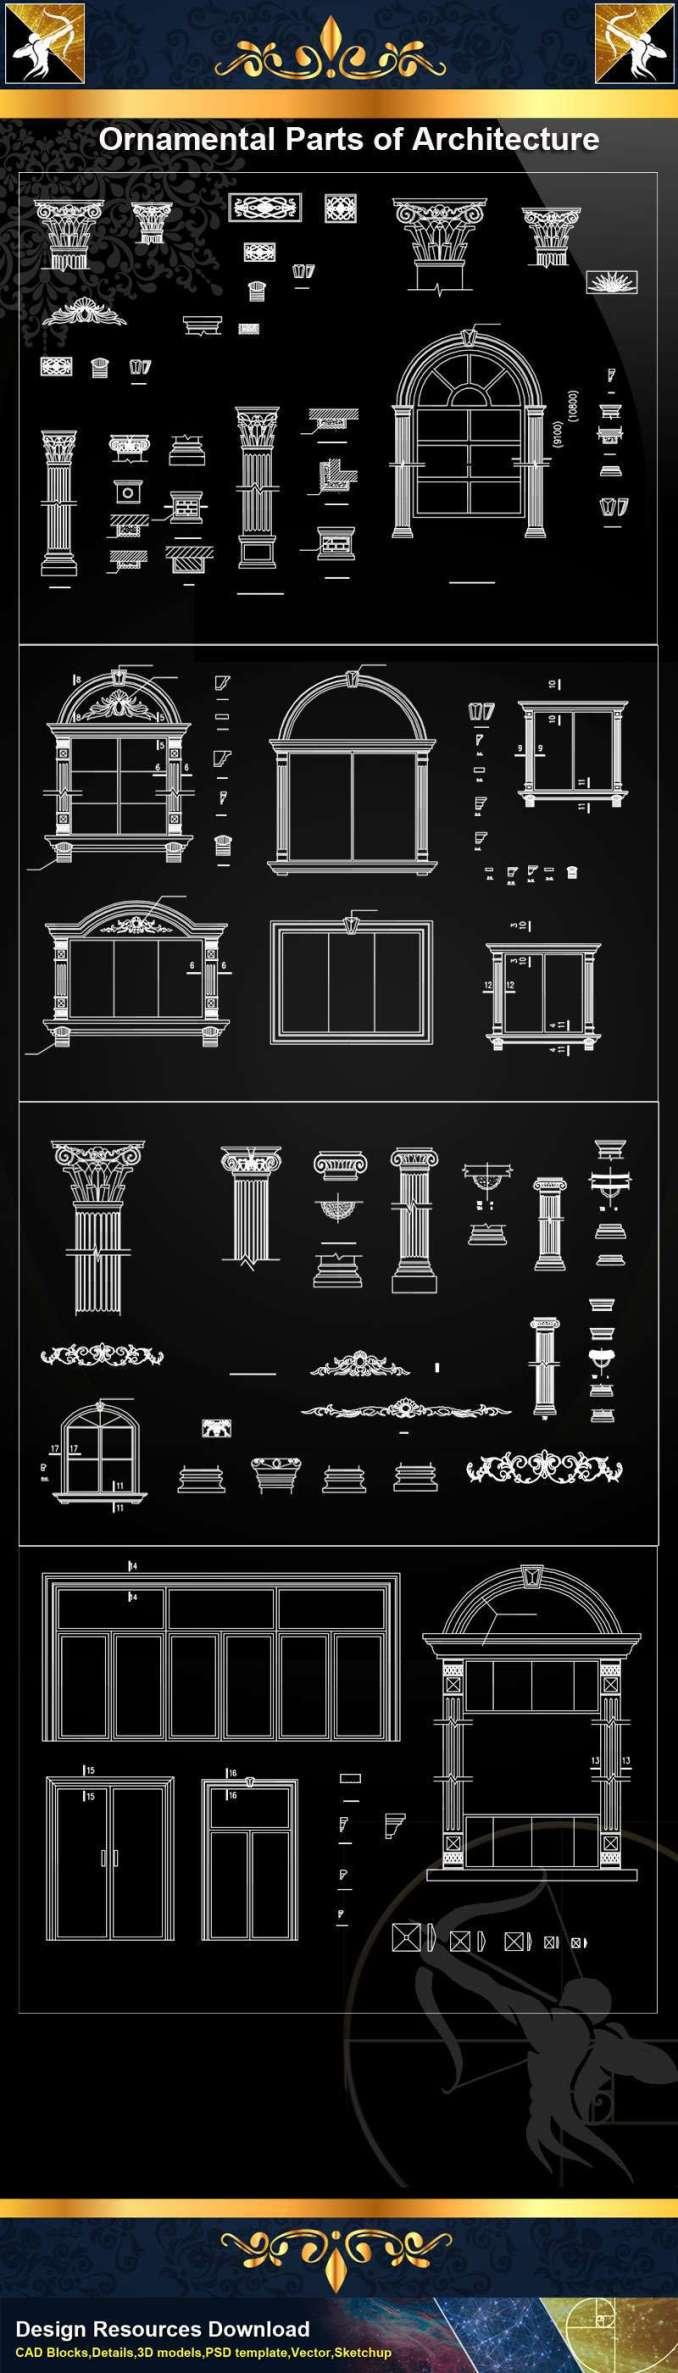 ★【Ornamental Parts of Architecture -Decoration Element CAD Blocks  V 8】@Autocad Decoration Blocks,Drawings,CAD Details,Elevation